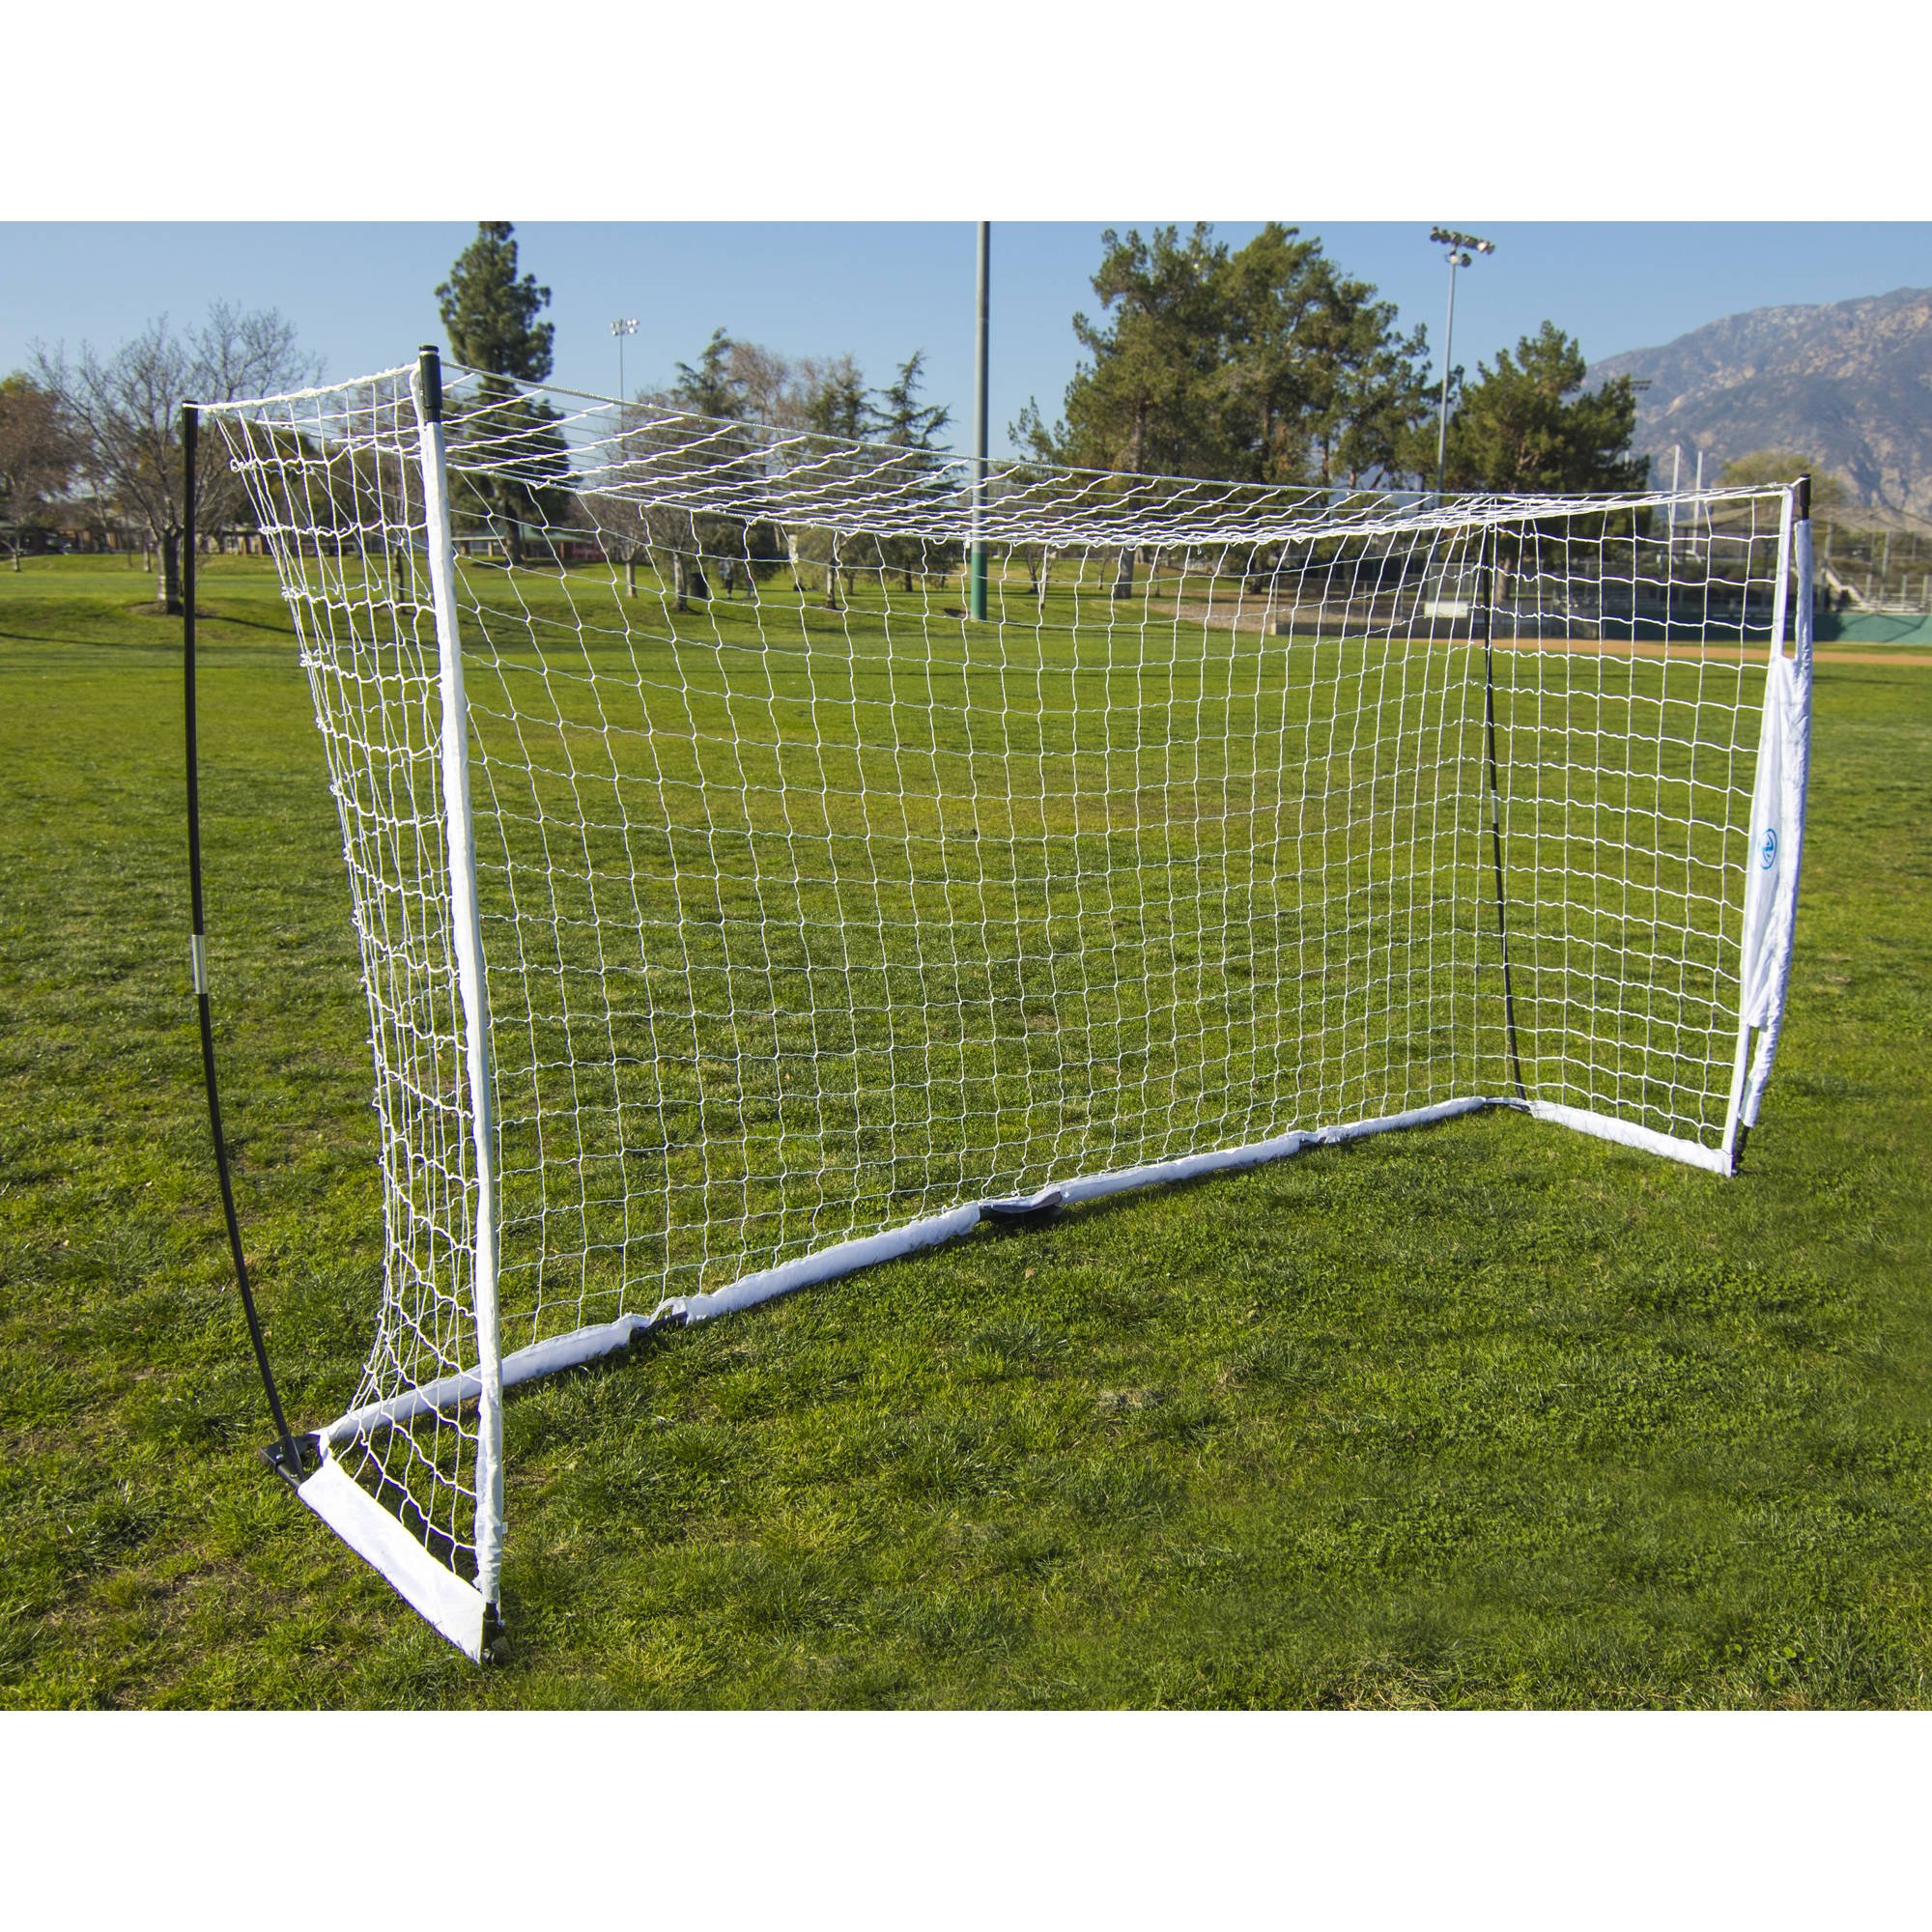 Athletic Works 12' x 6' Pop-Up Soccer Goal - Walmart.com